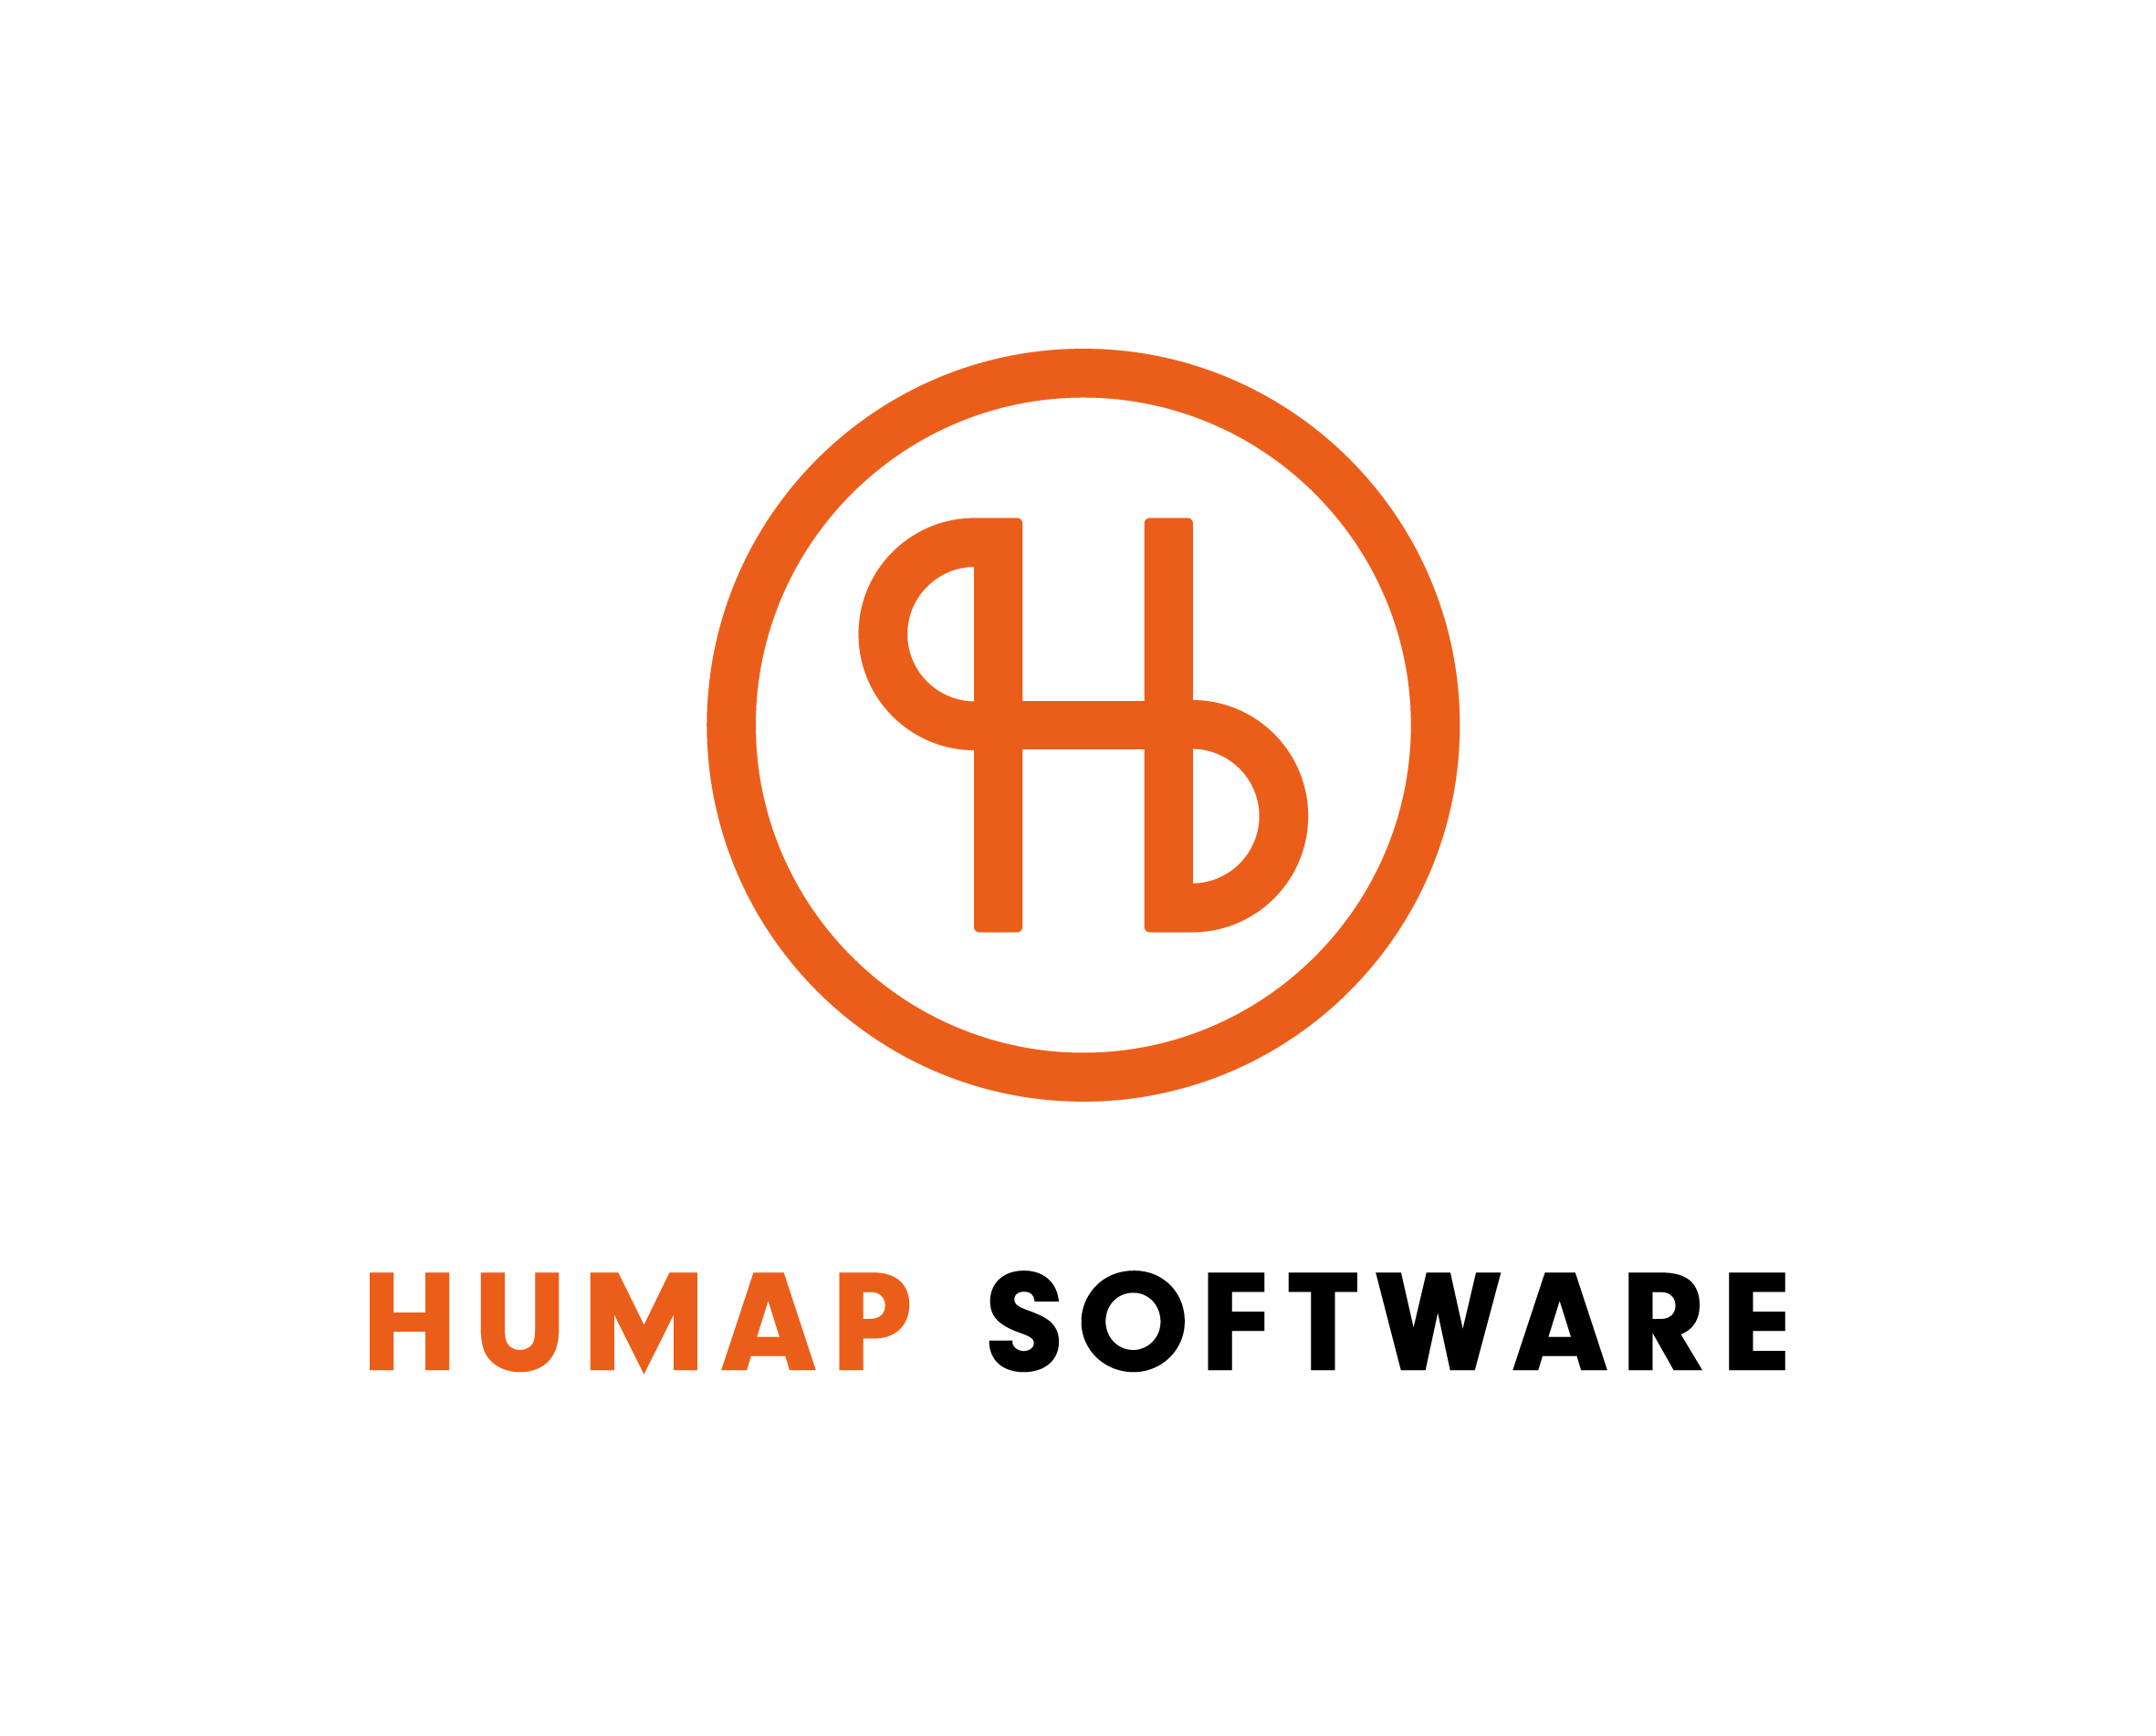 humap-software-logo-RGB-300ppi.png